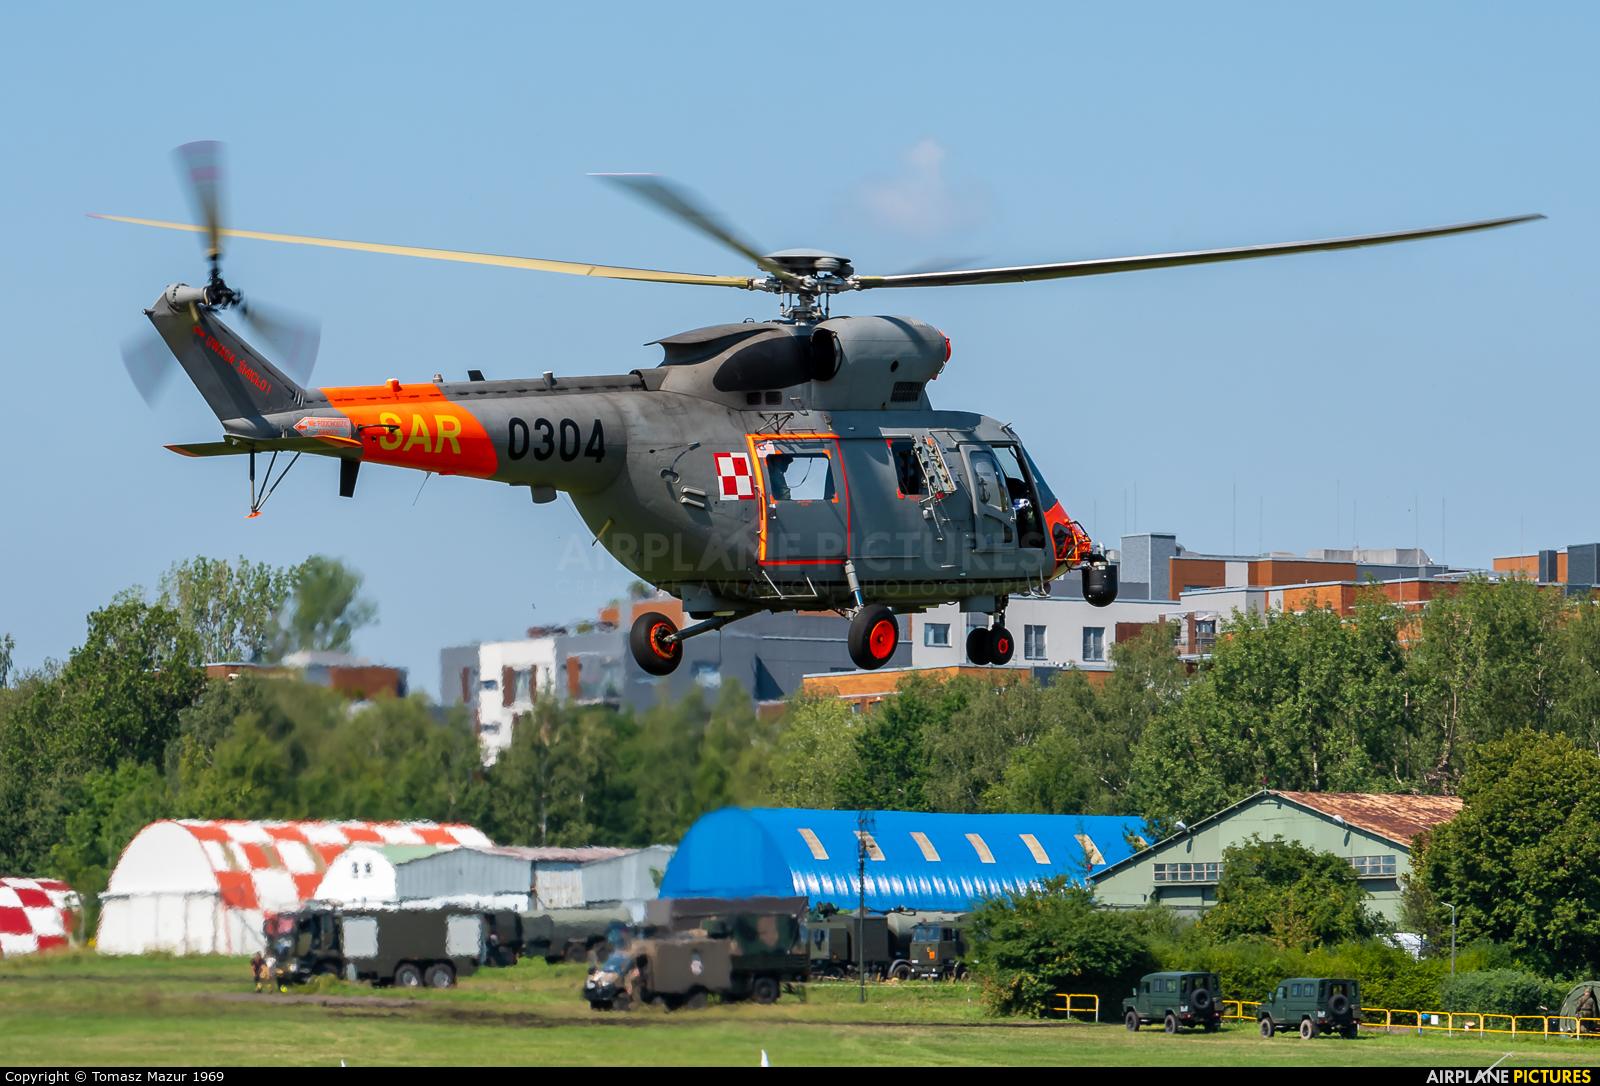 Poland - Navy 0304 aircraft at Katowice Muchowiec